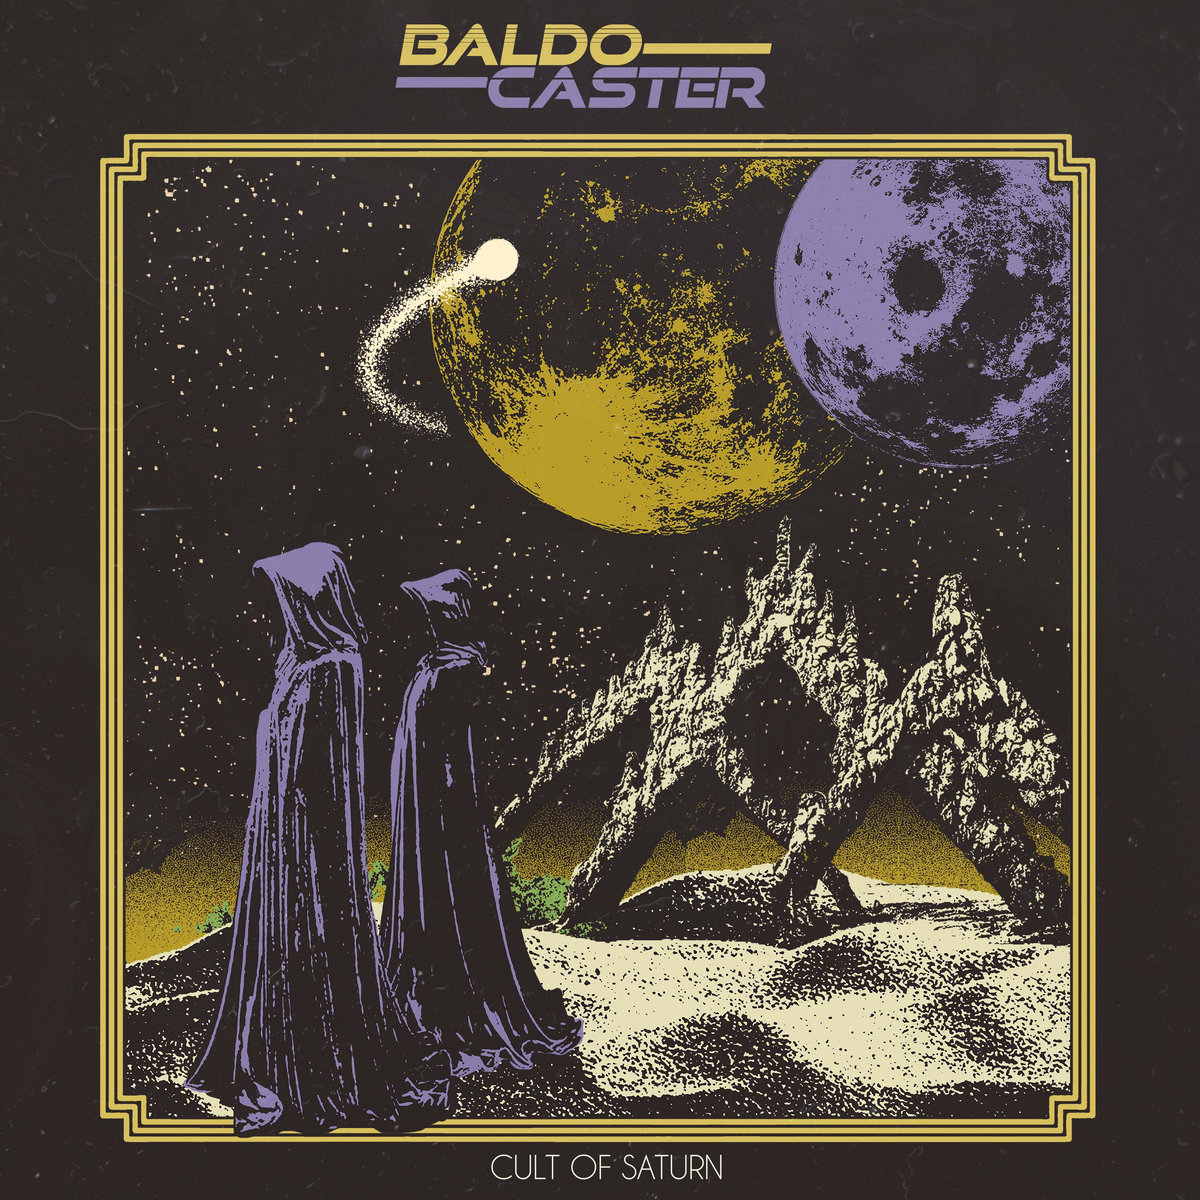 Baldocaster Cult of Saturn